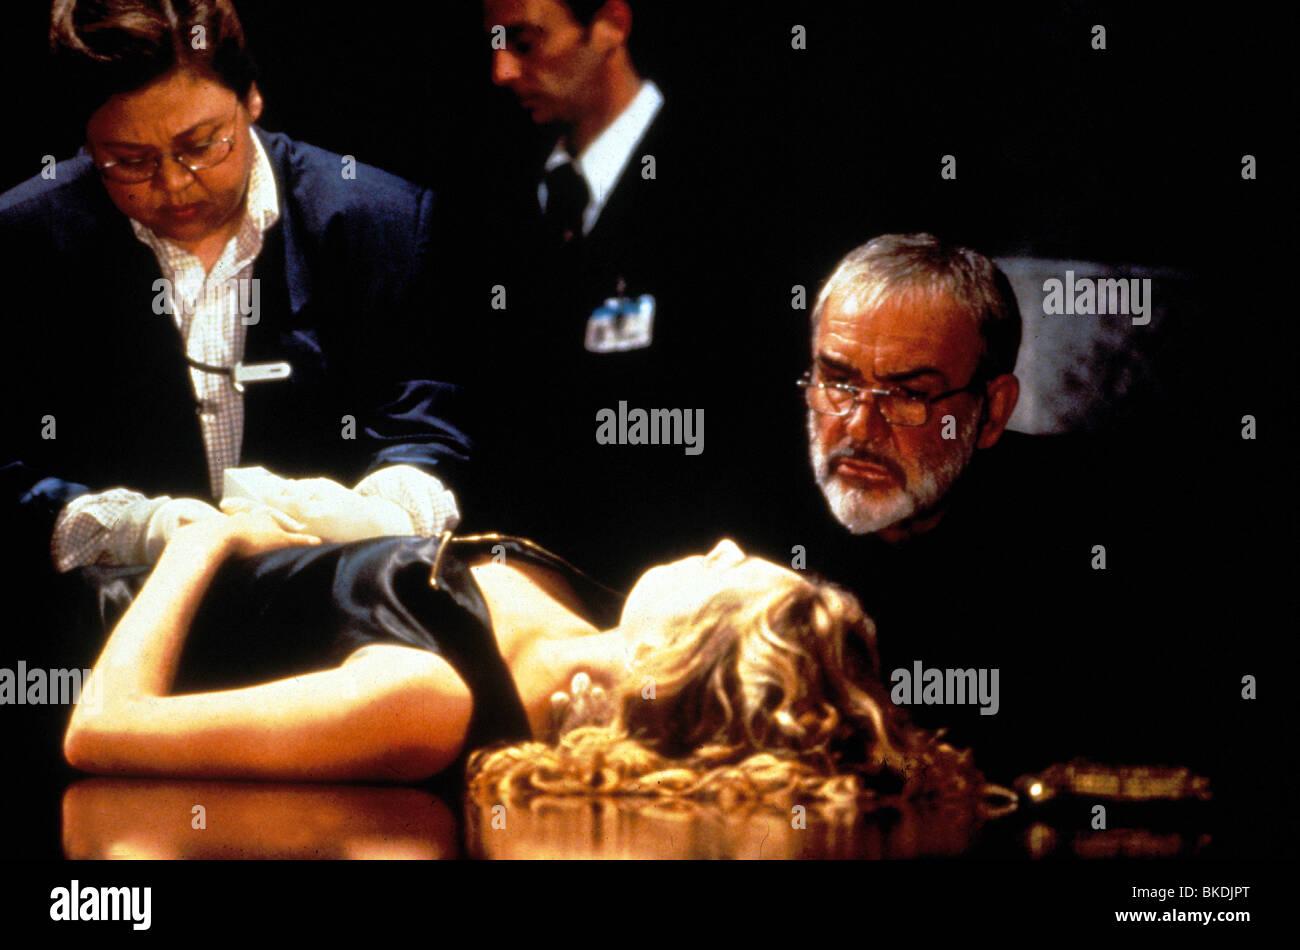 Kyoko Aizome,Peyton Hayslip Hot images Preeti Desai,Andy Serkis (born 1964)